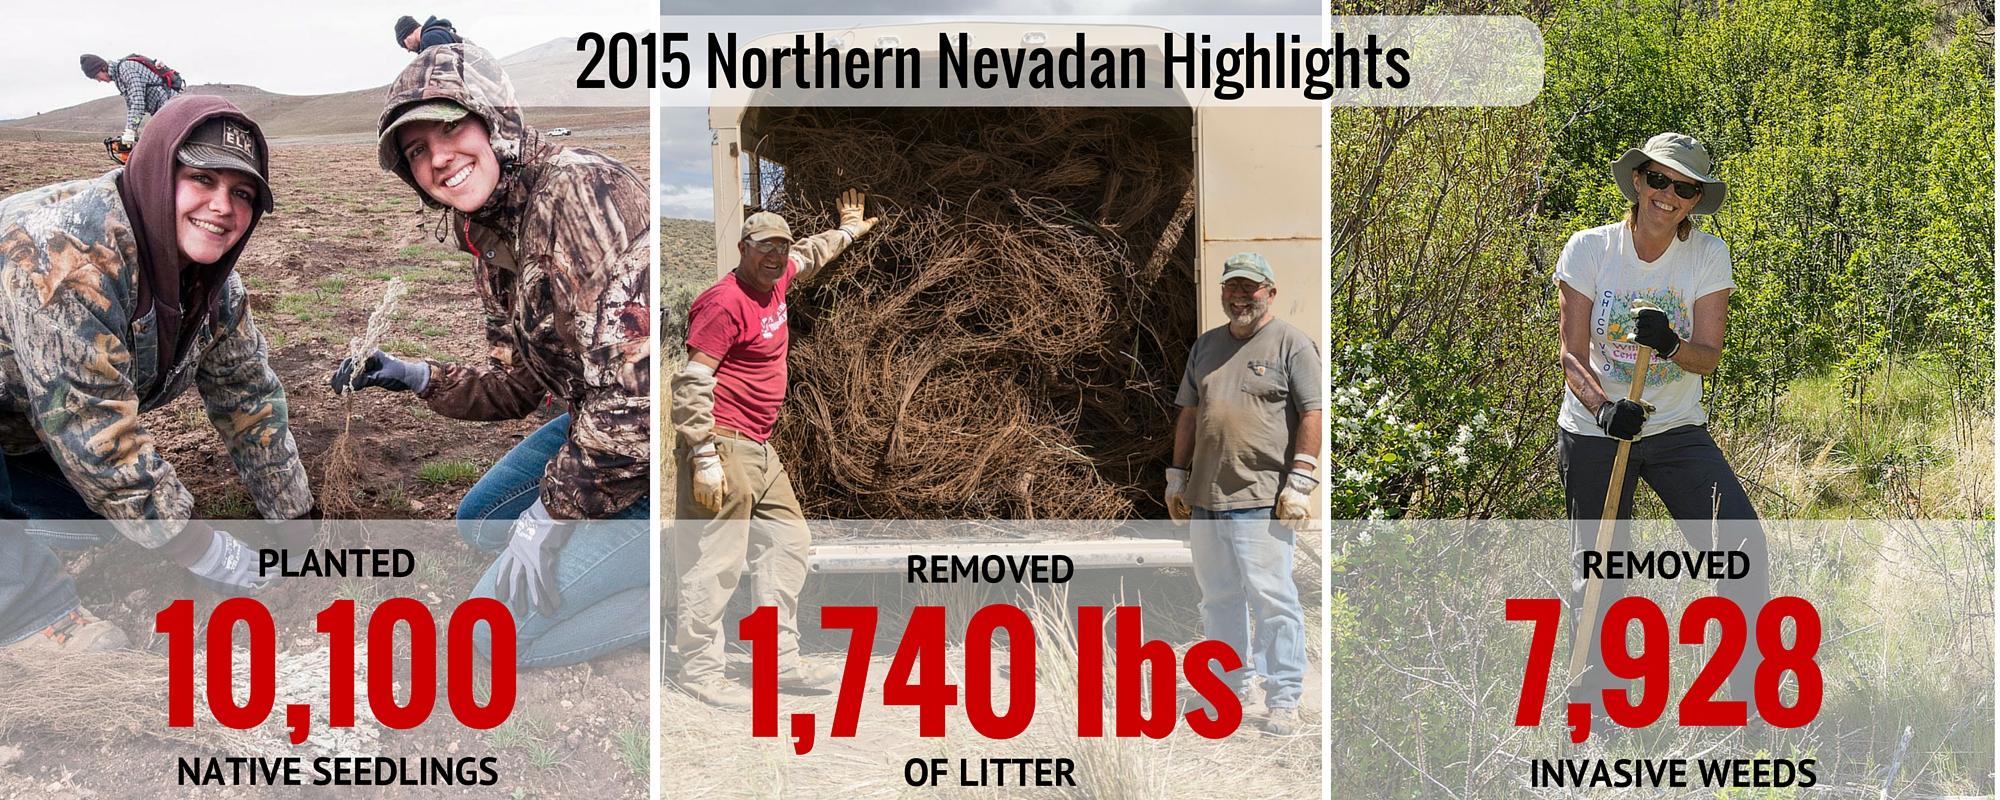 2015_Northern_NV_HIghlights.jpg